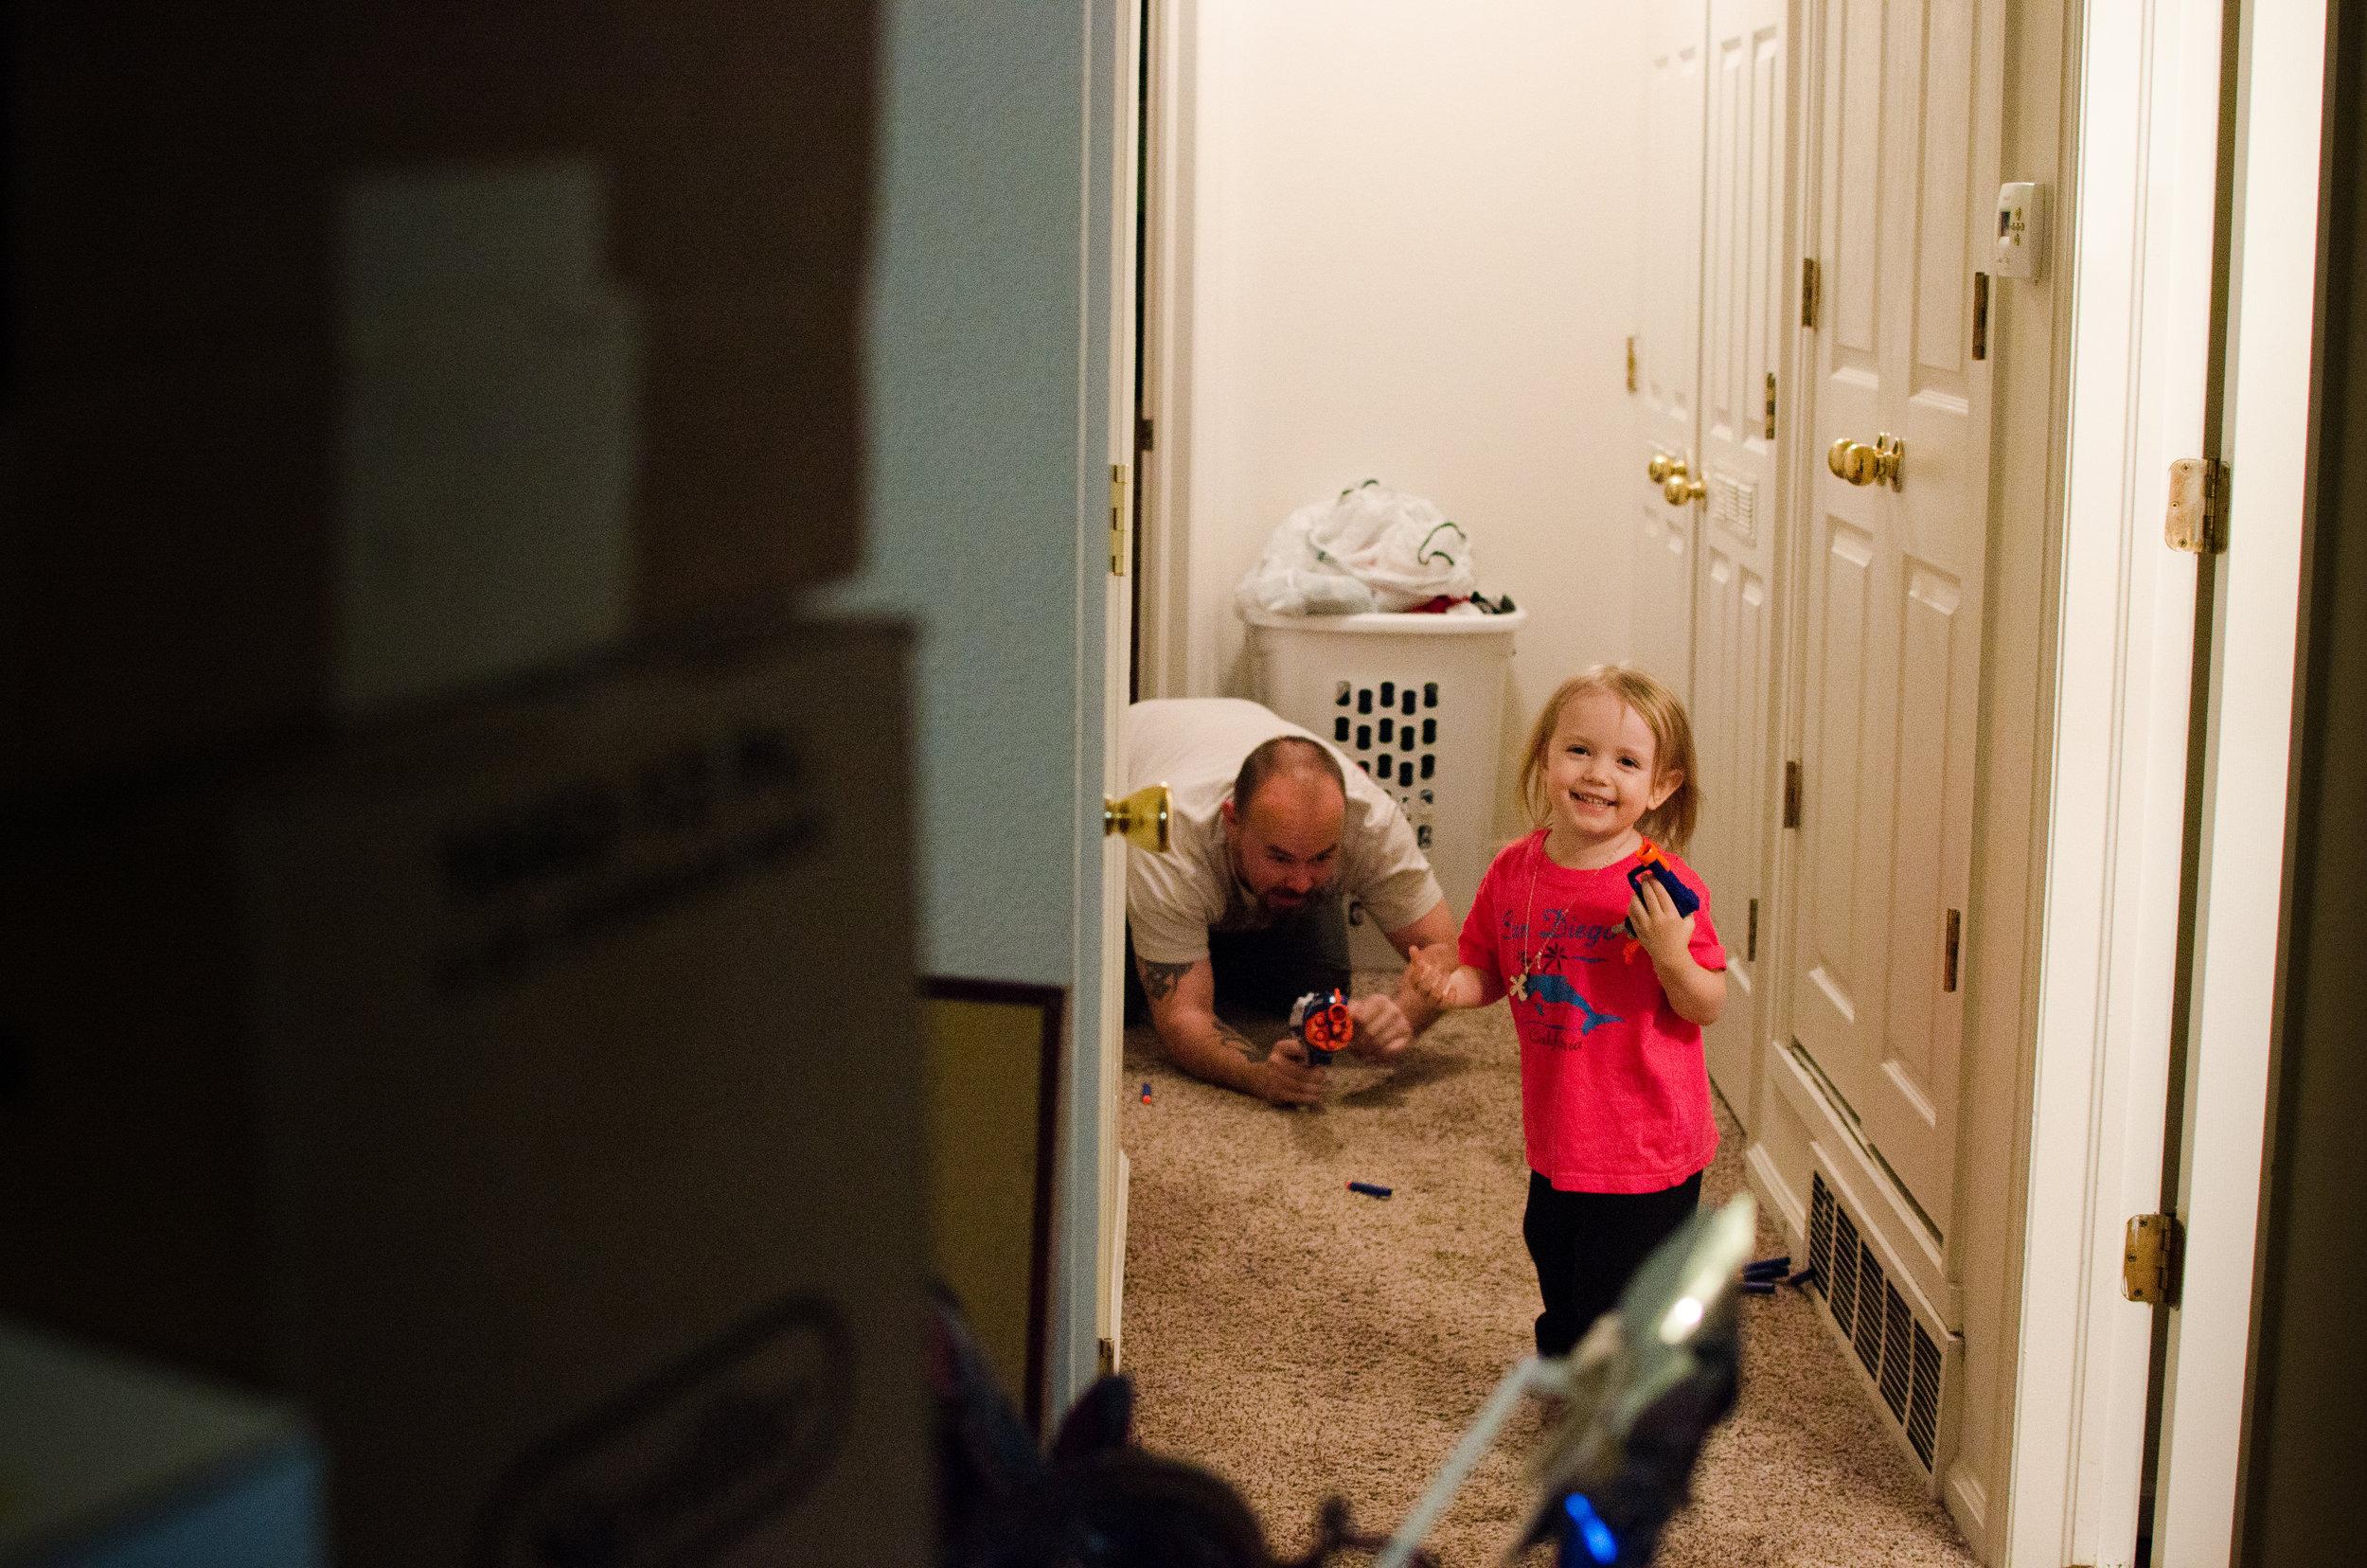 nerf gun fight, moving fun, love family colorado